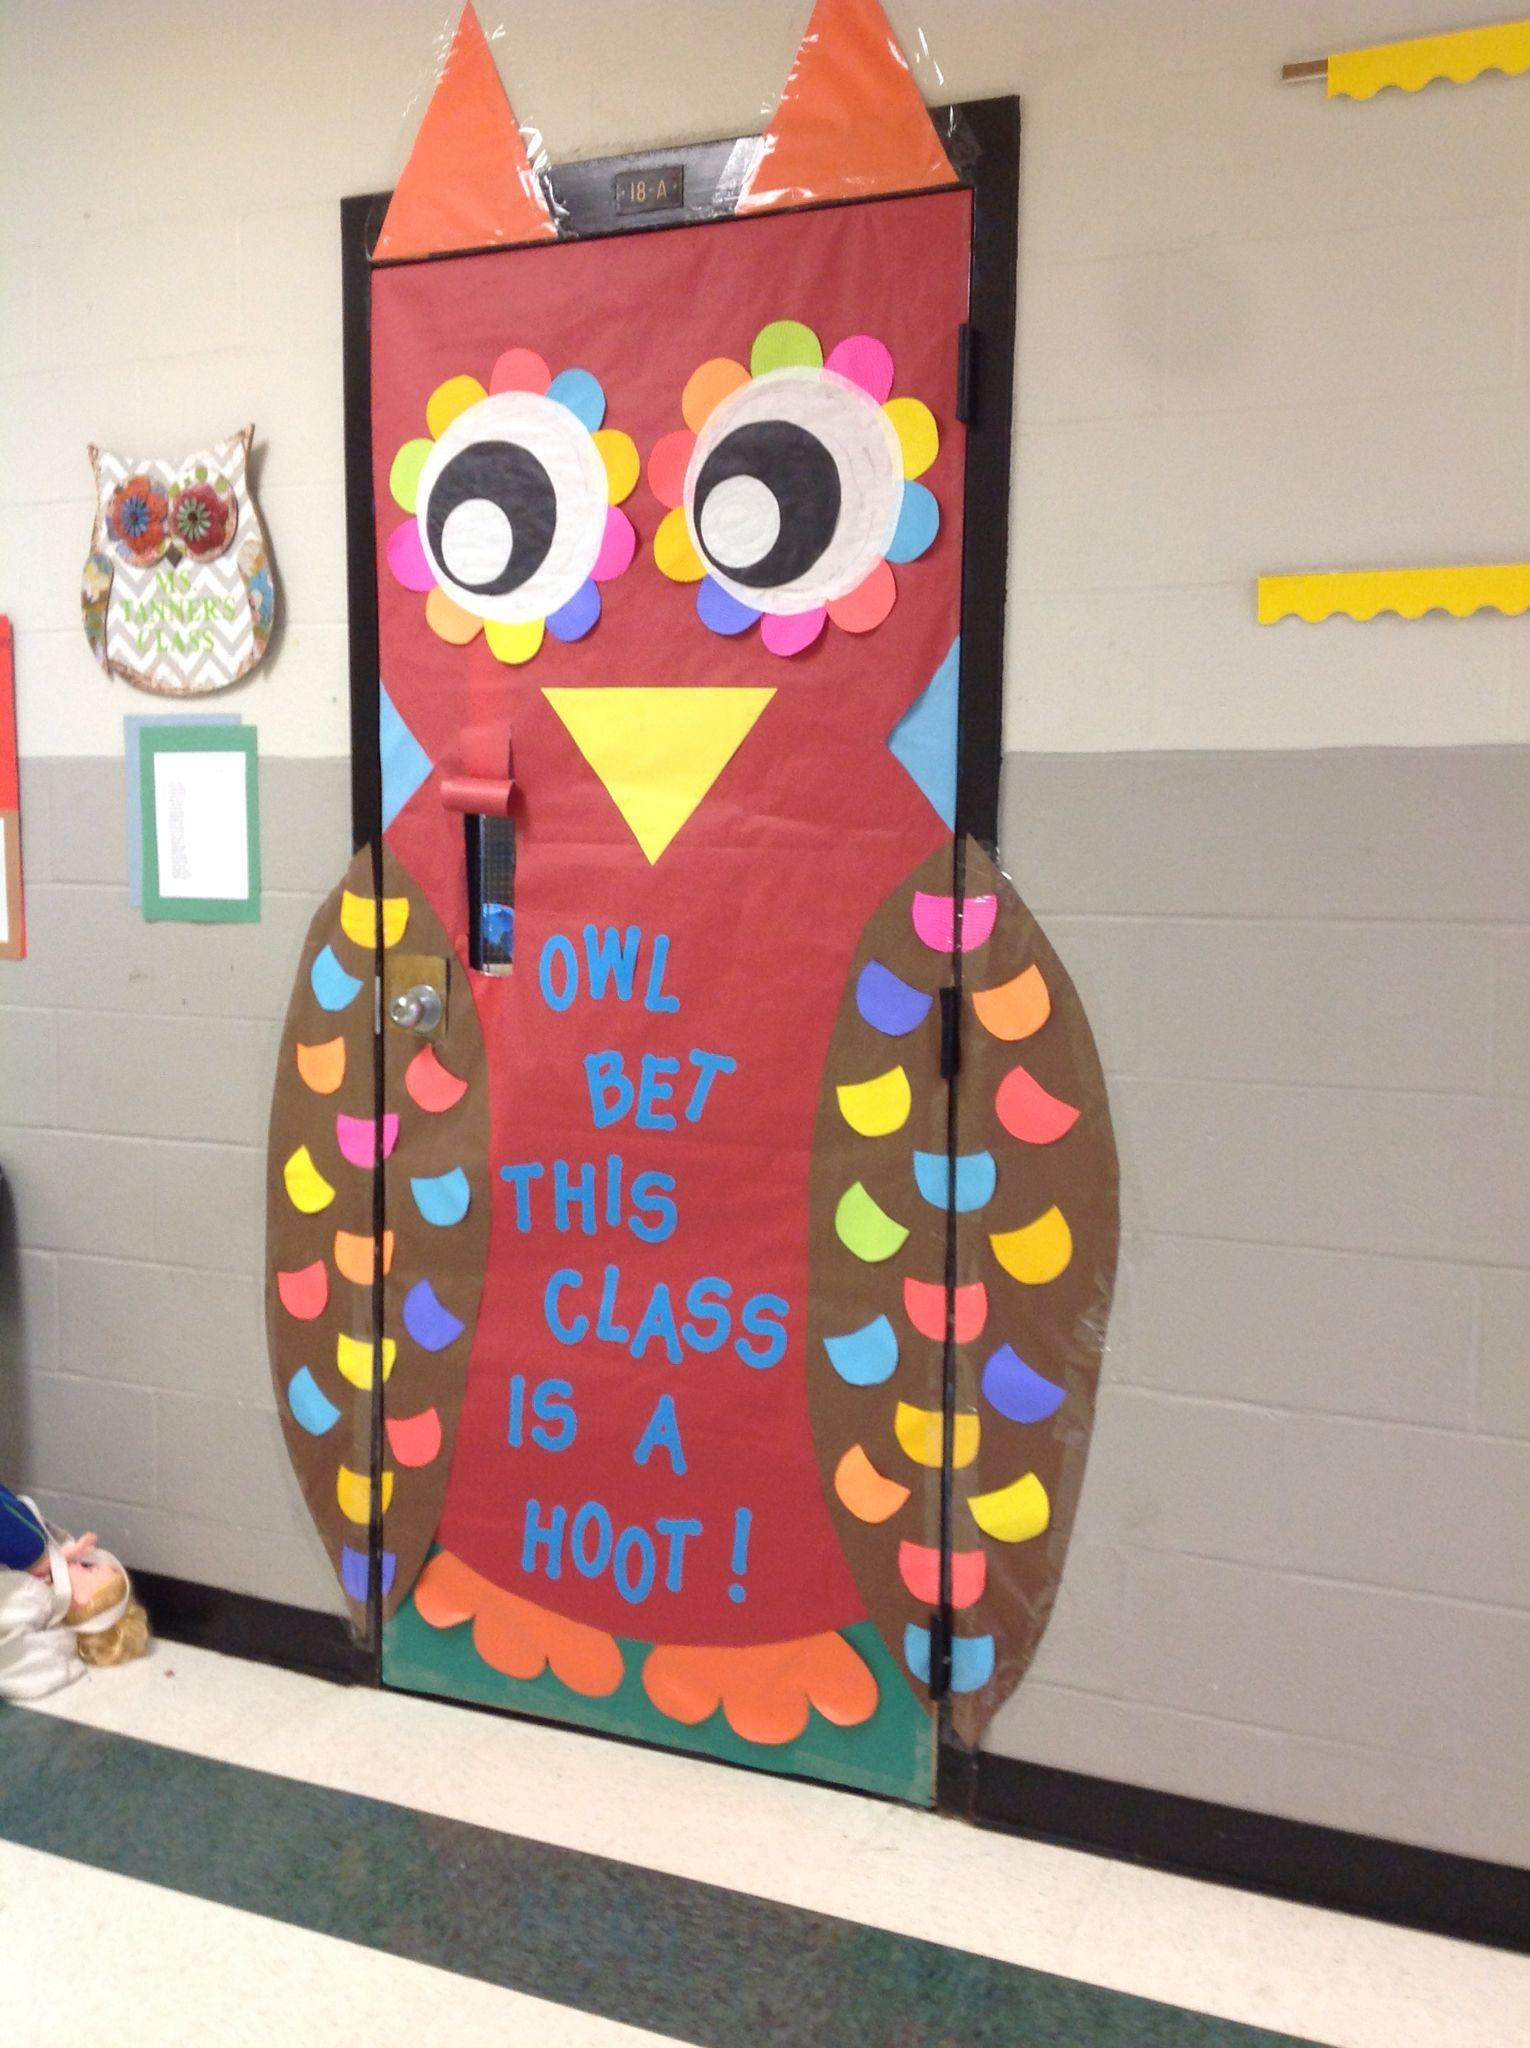 Best paint colors for preschool classrooms - Adding A Panel To The Wall In Preschool Doorfall Preschoolpreschool Ideasclassroom